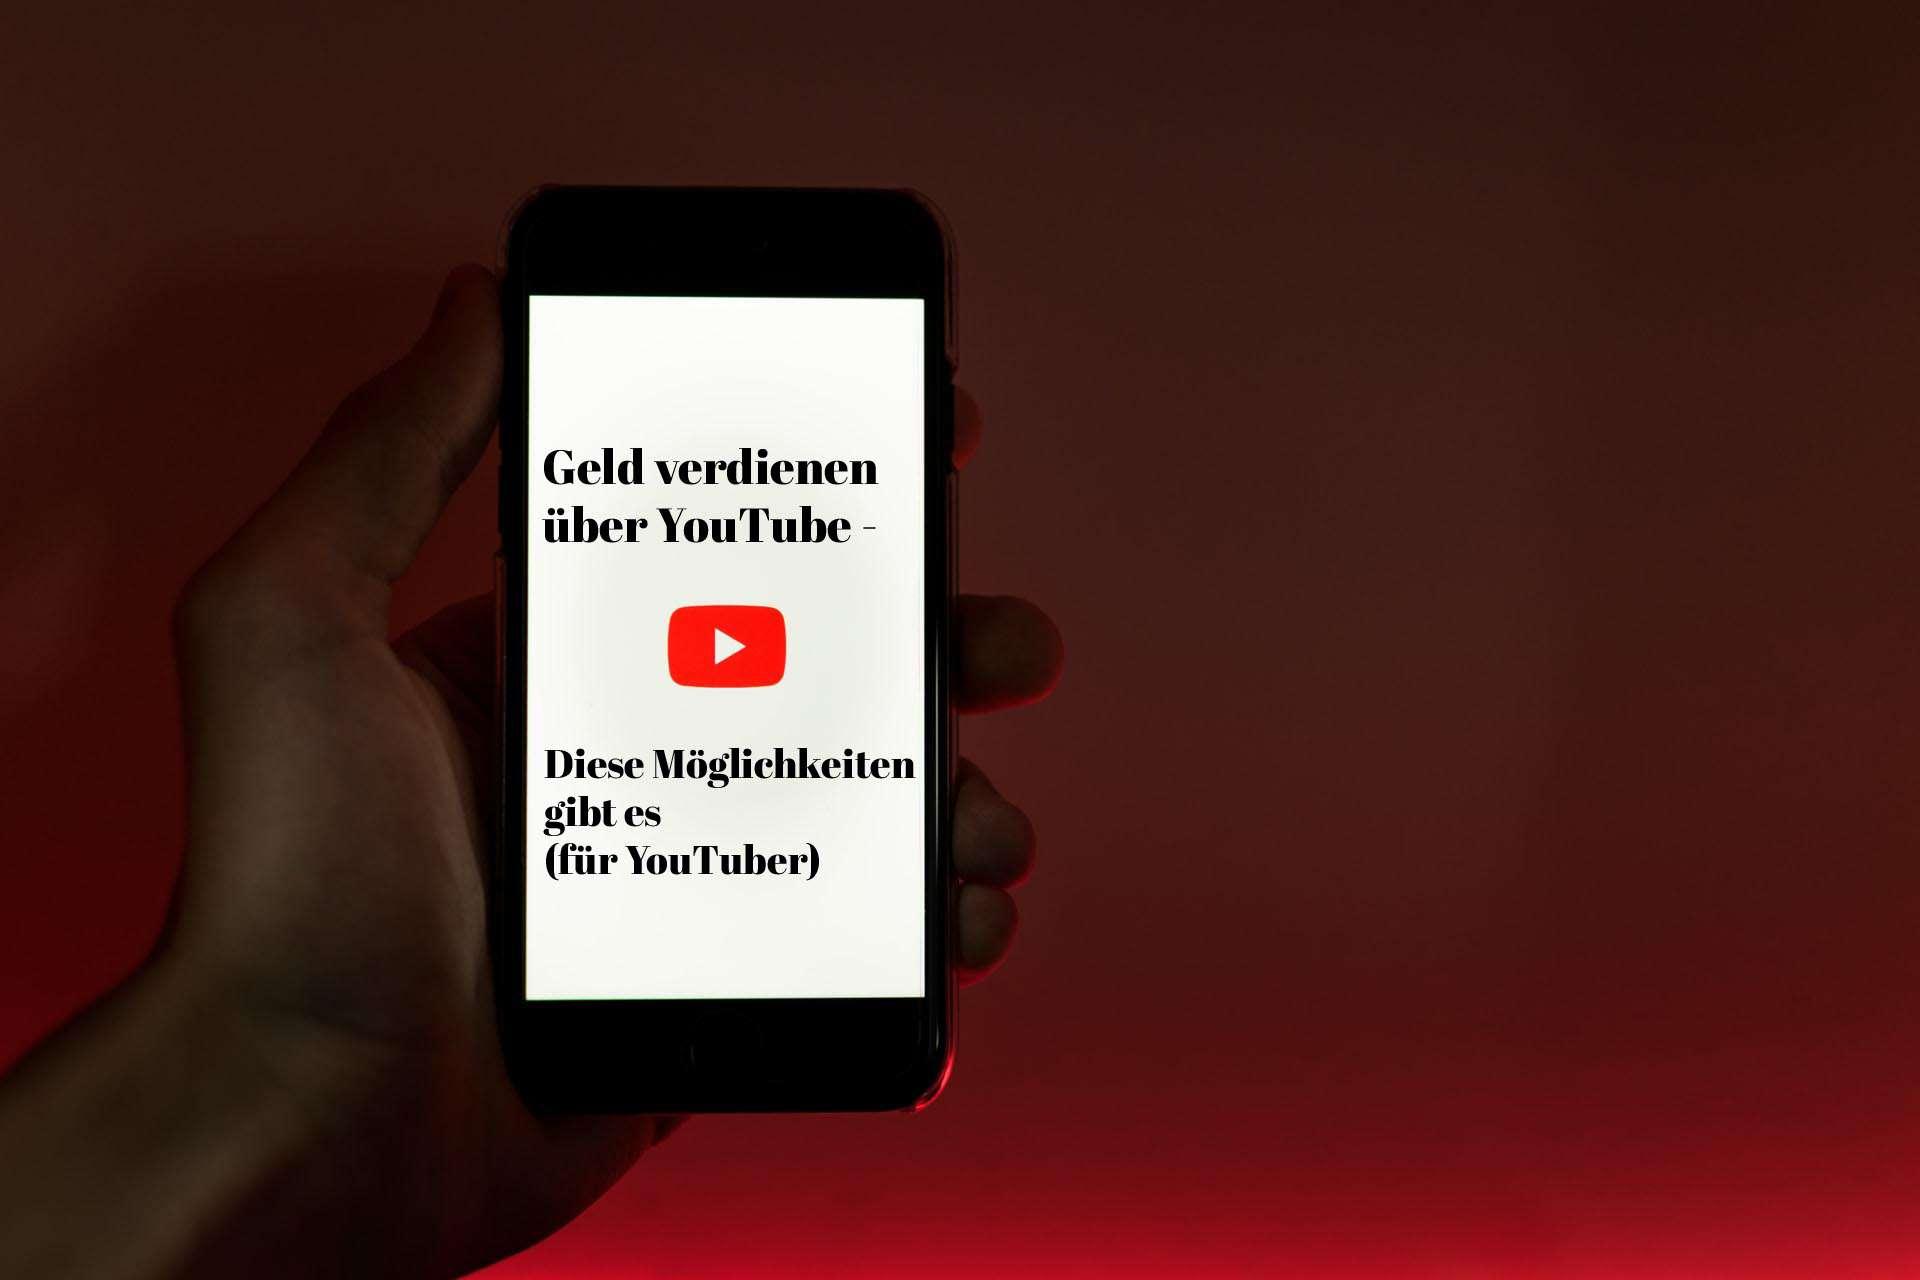 Geld verdienen über Youtube